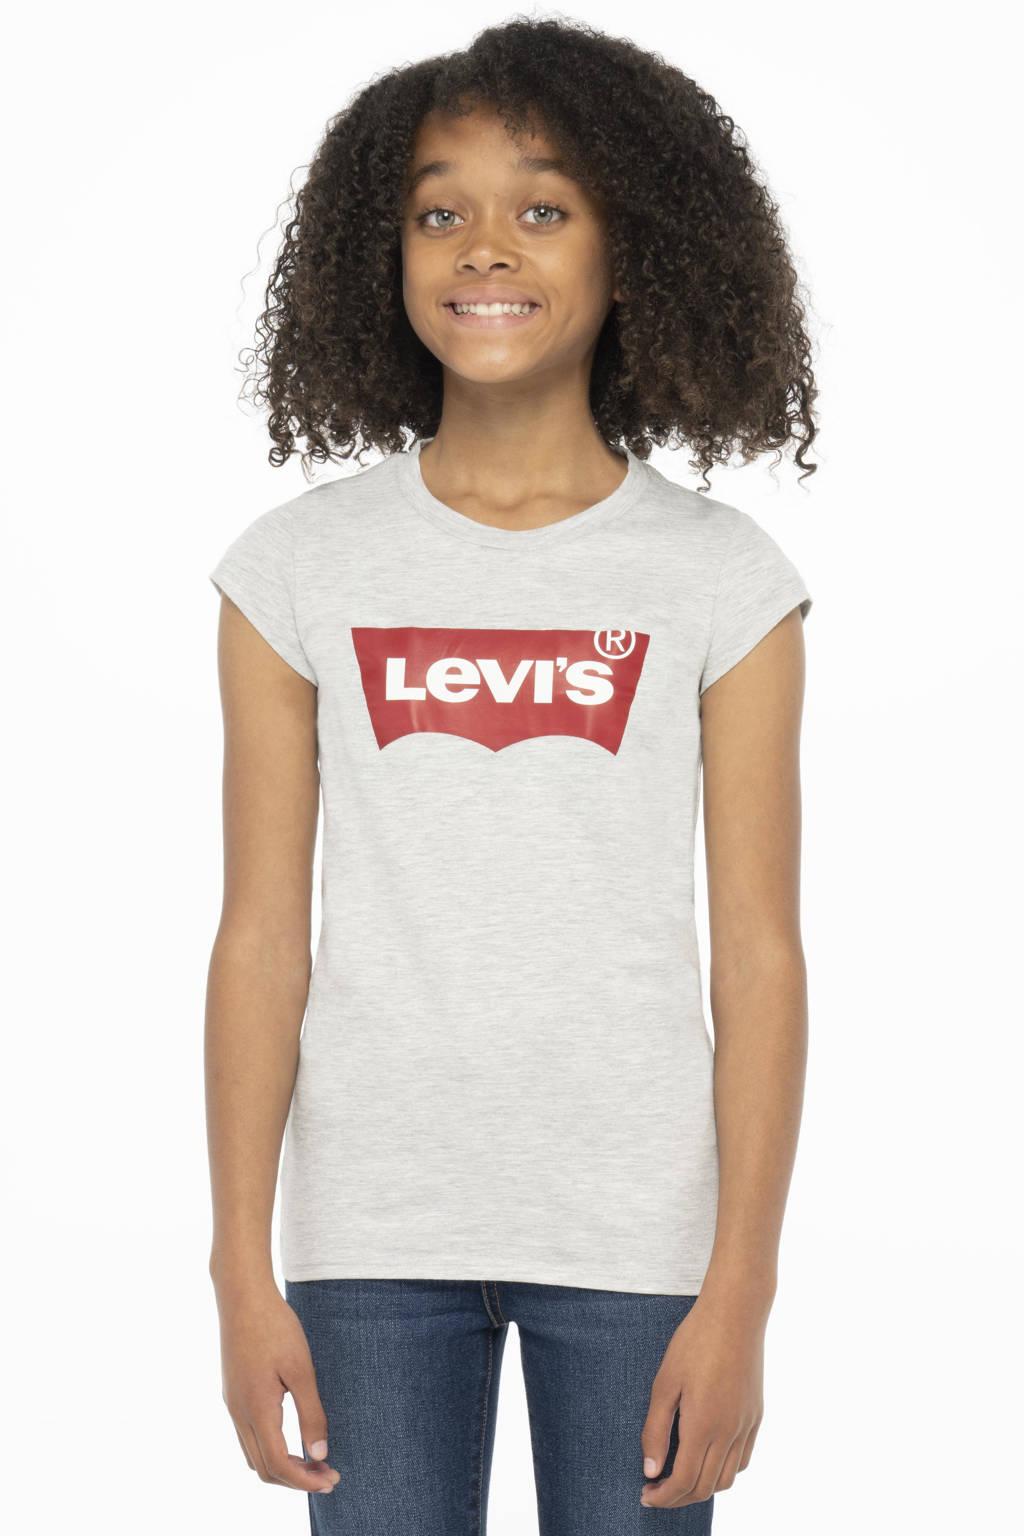 Levi's Kids T-shirt Batwing met logo lichtgrijs, Lichtgrijs